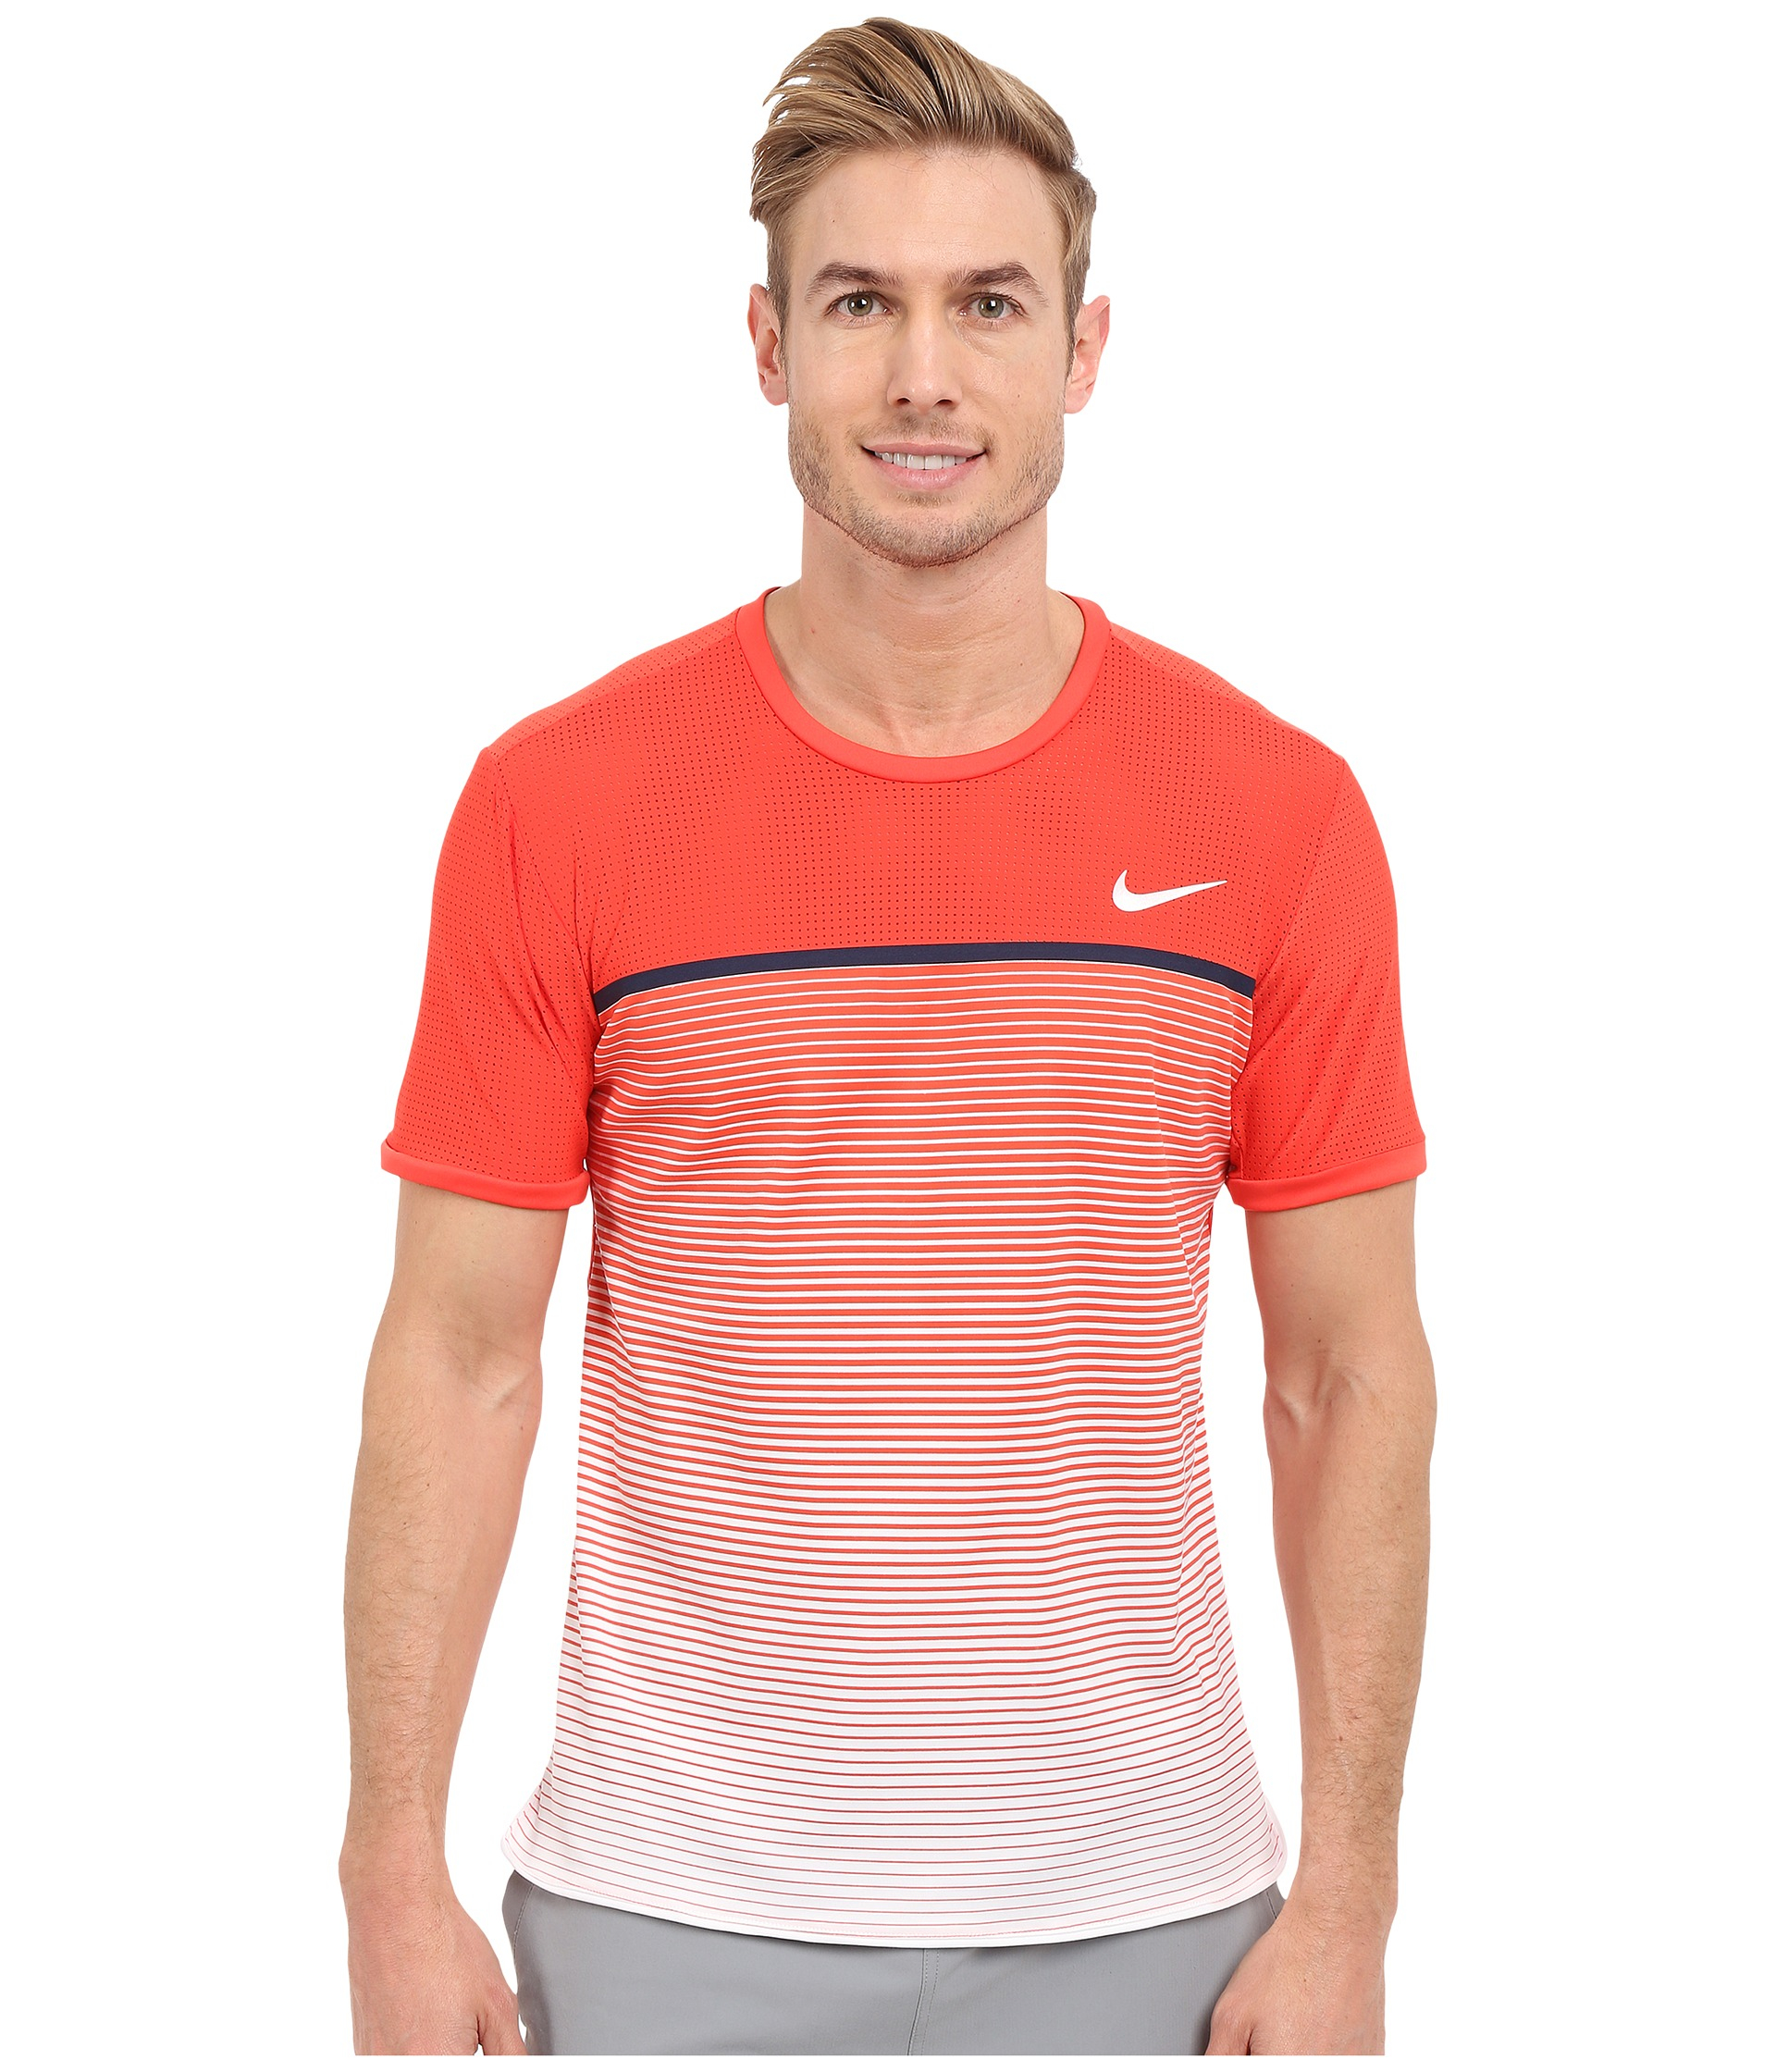 24b603d2 Nike Challenger V Neck T Shirt Mens | Top Mode Depot